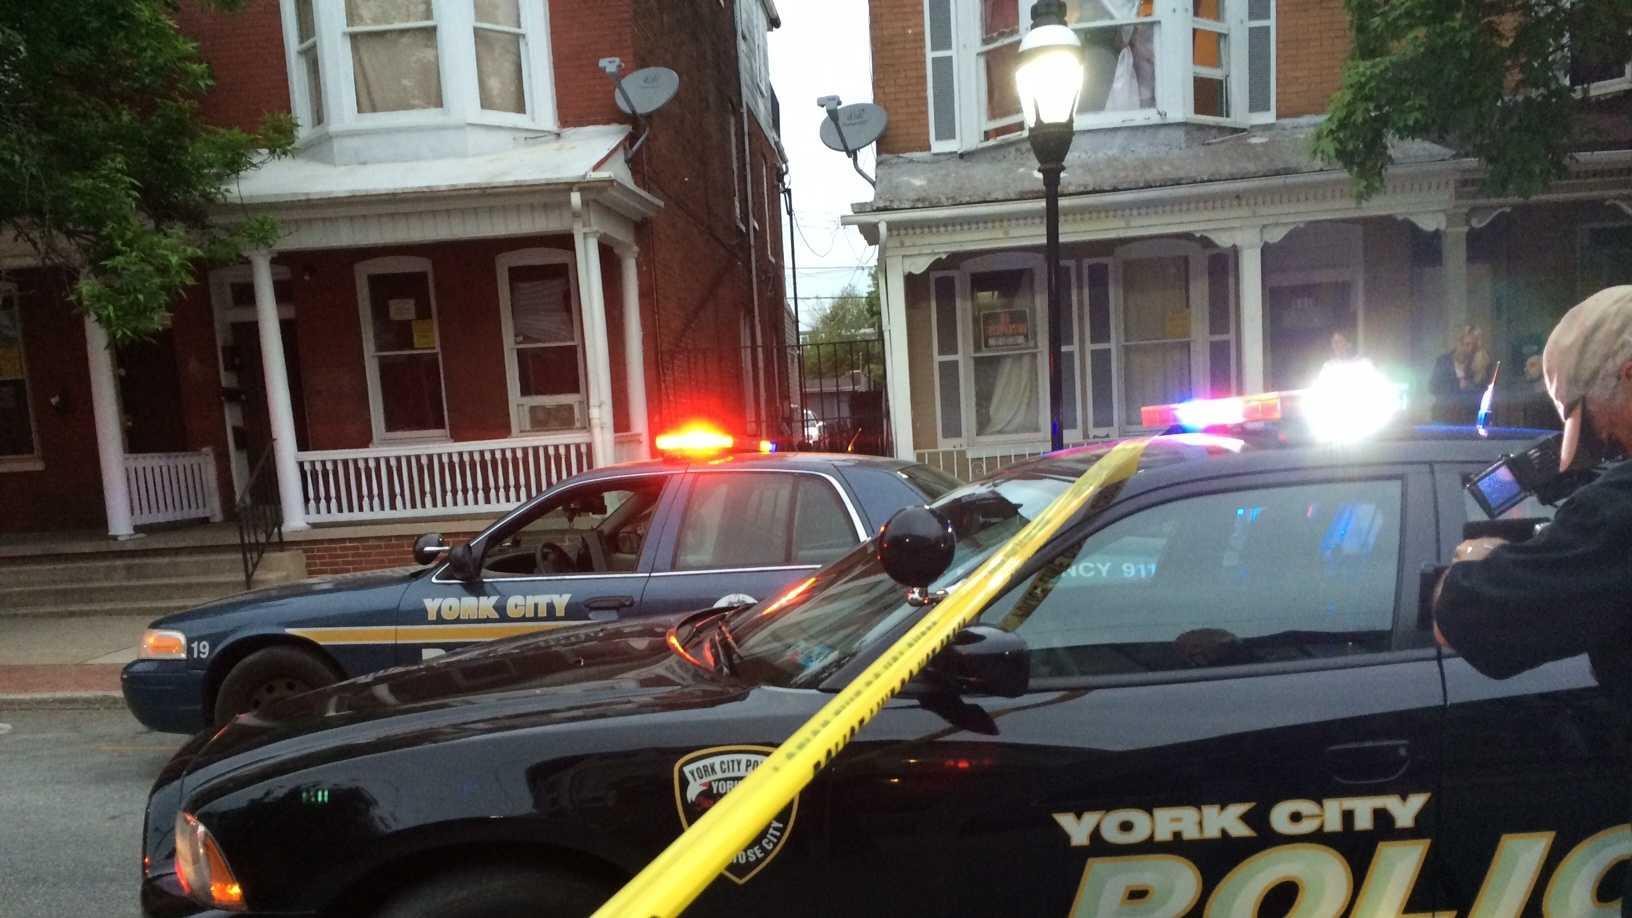 5.20.14 York shooting 05.JPG